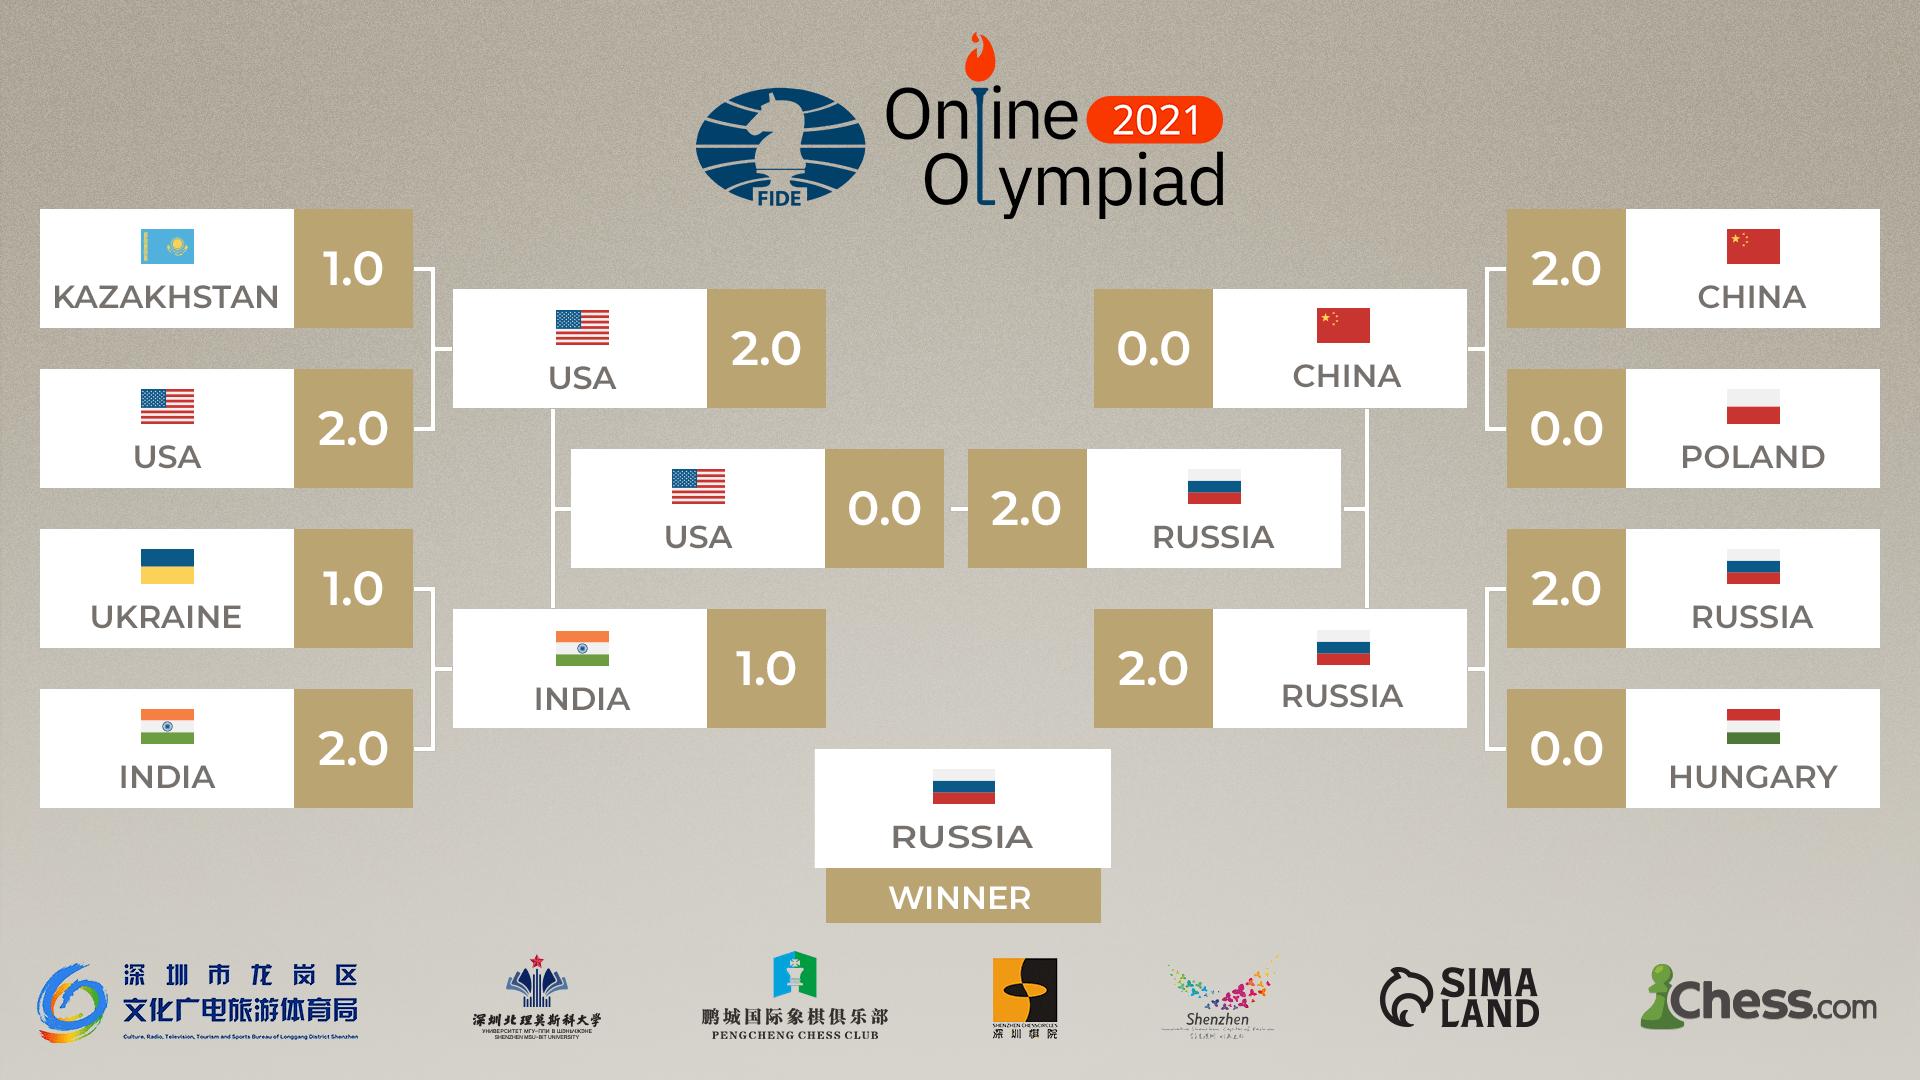 Результаты онлайн-олимпиады ФИДЕ-2021